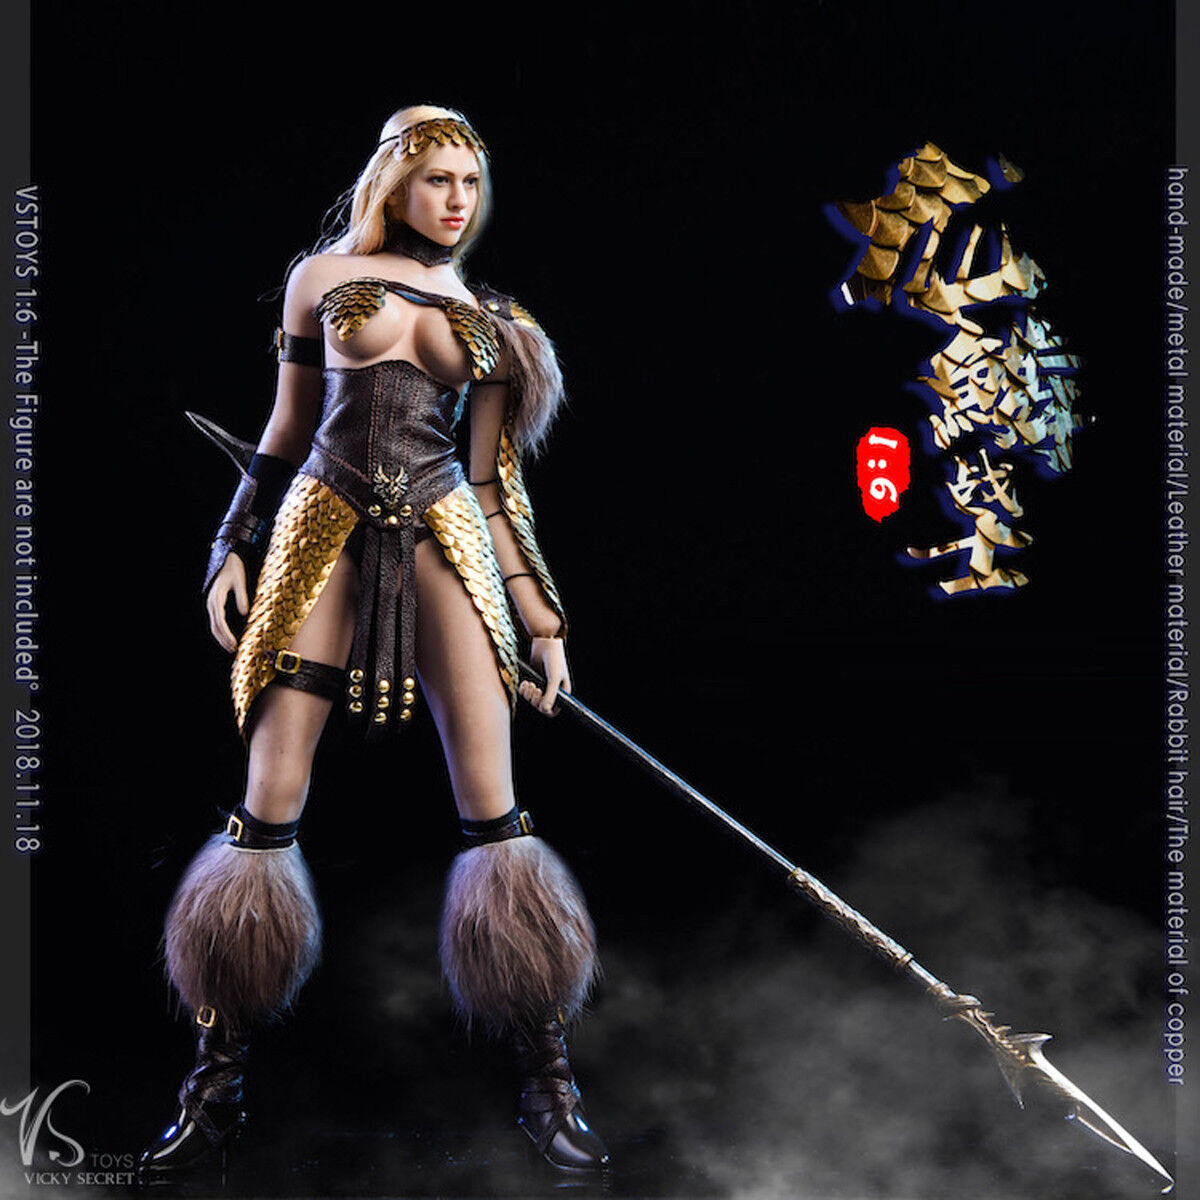 VSTOYS 1/6 18XG32 A  Dragon Scale Female Warrior Set Accessories